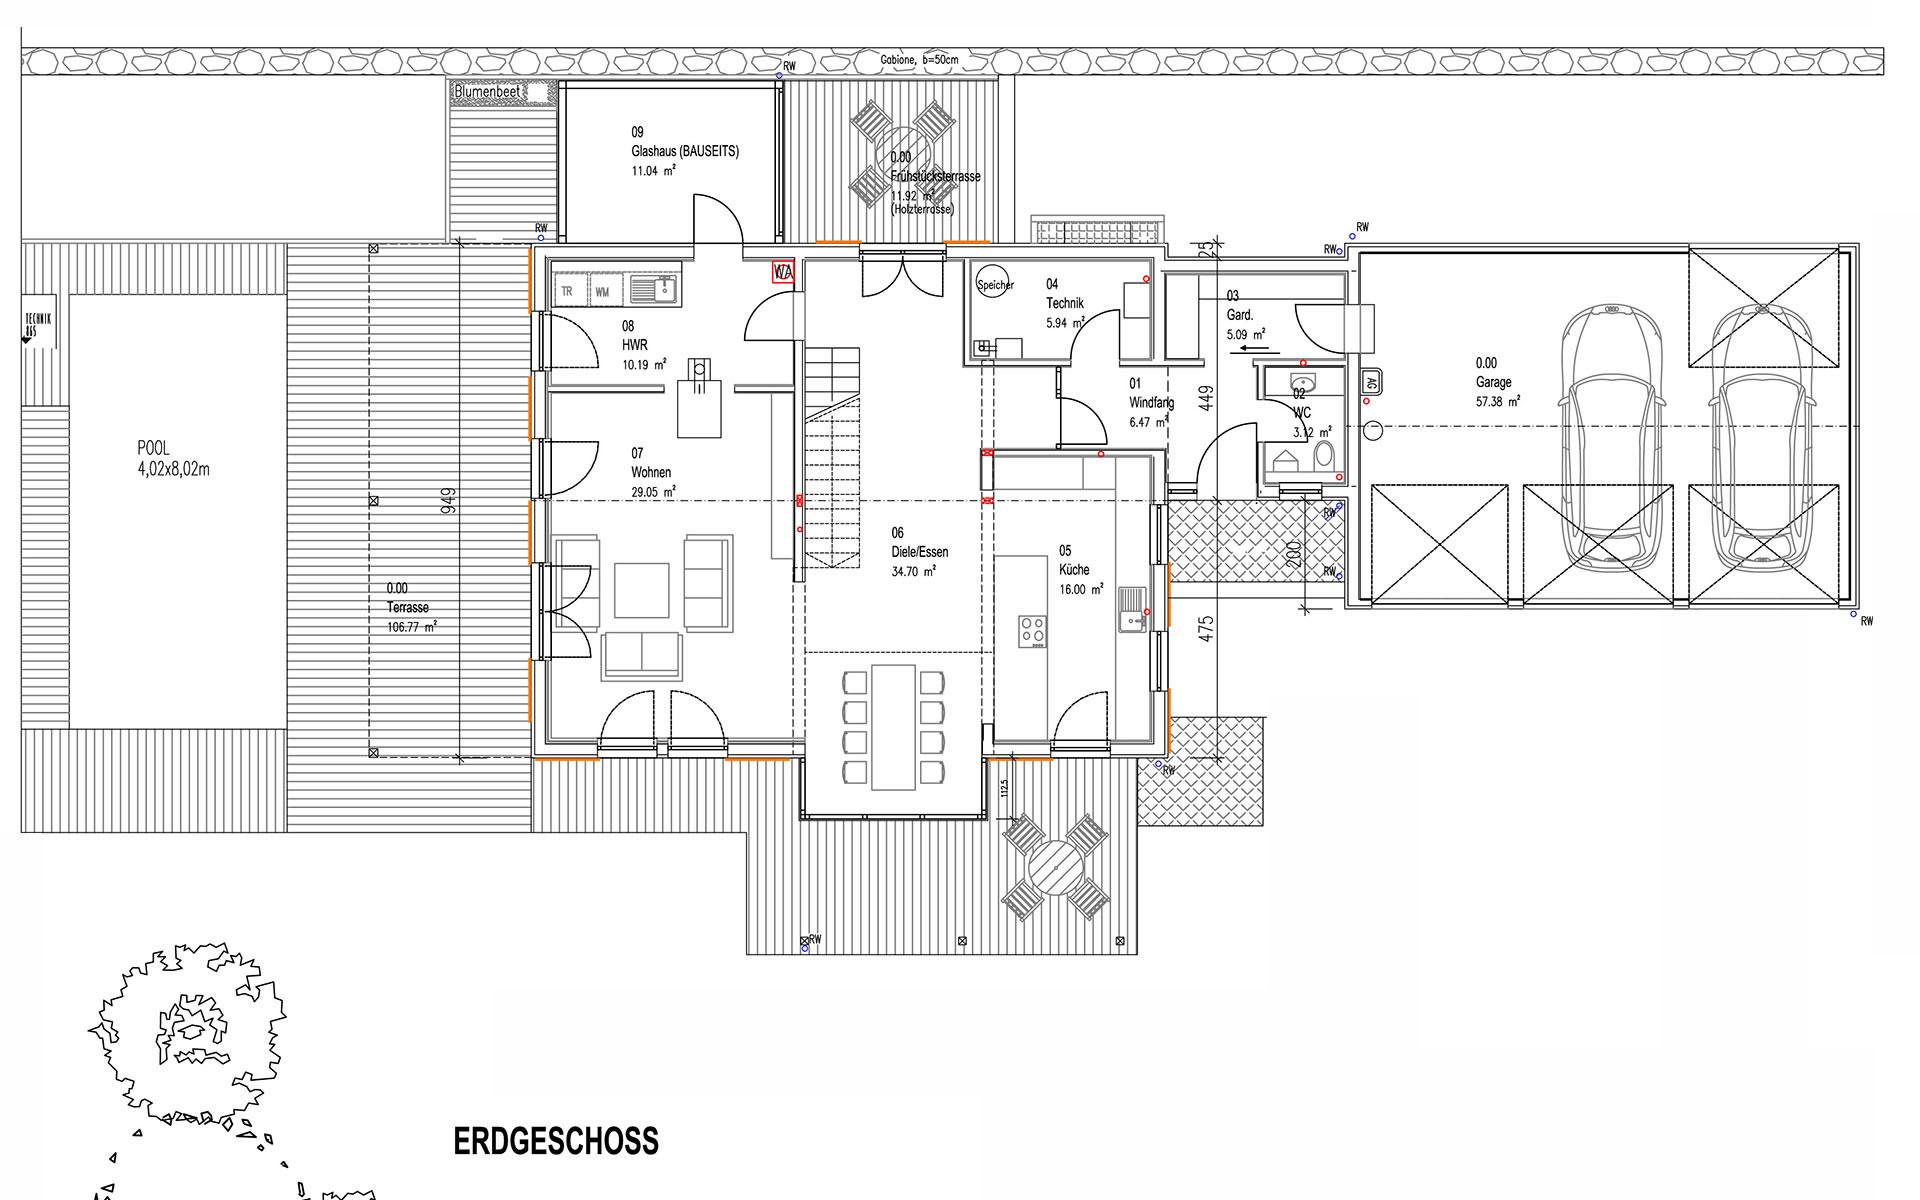 Erdgeschoss Niederhofer von Sonnleitner Holzbauwerke GmbH & Co. KG